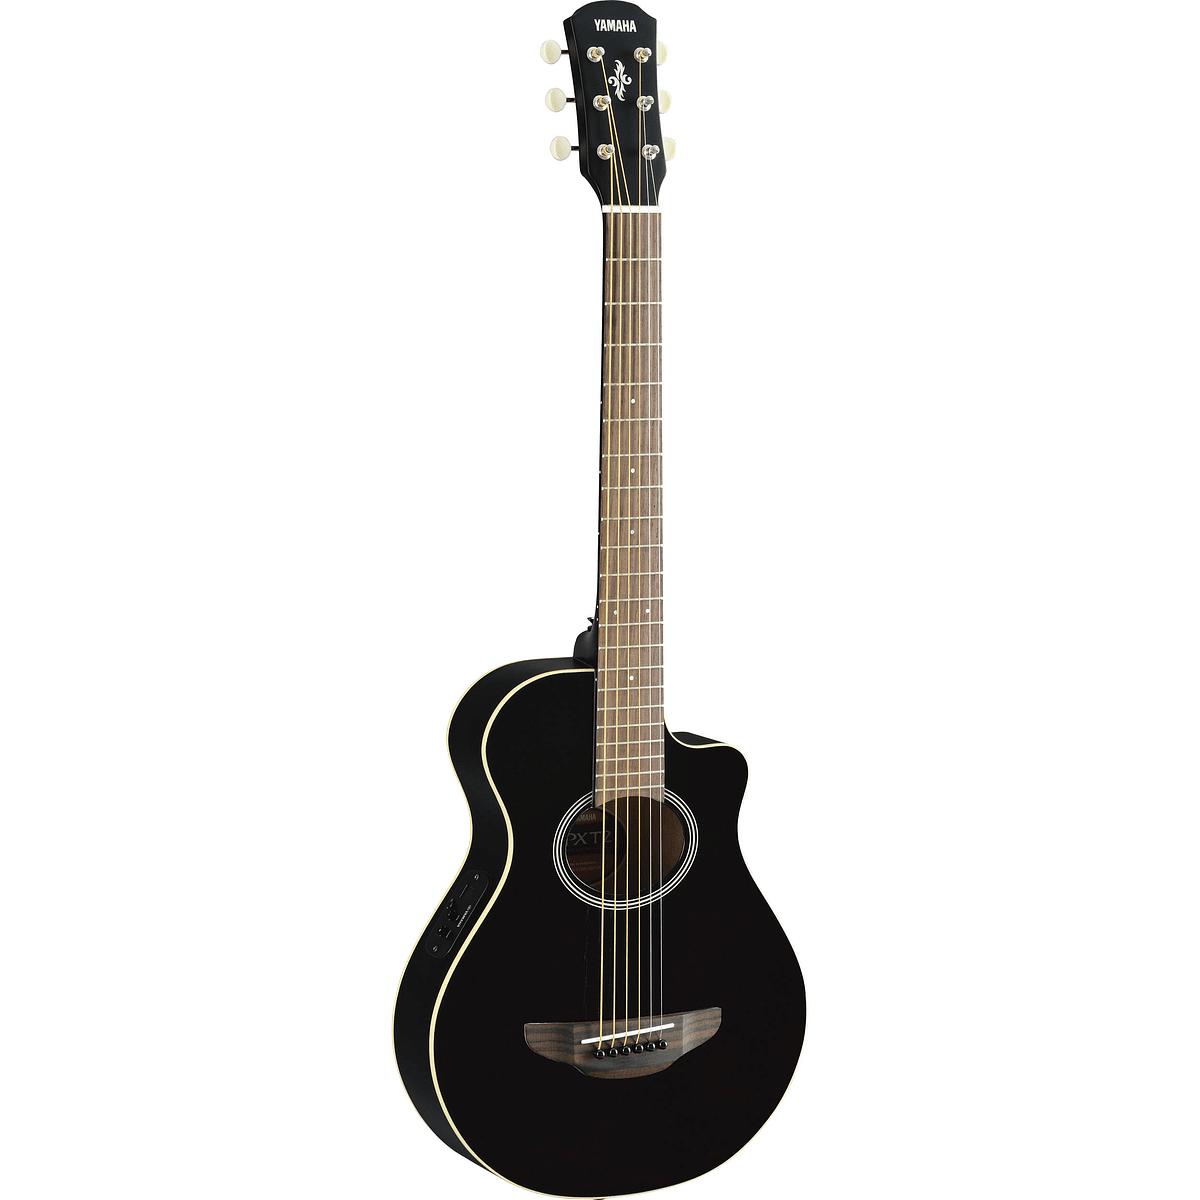 Yamaha 3/4 Size Acoustic Electric Cutaway Guitar w/Gigbag- Black